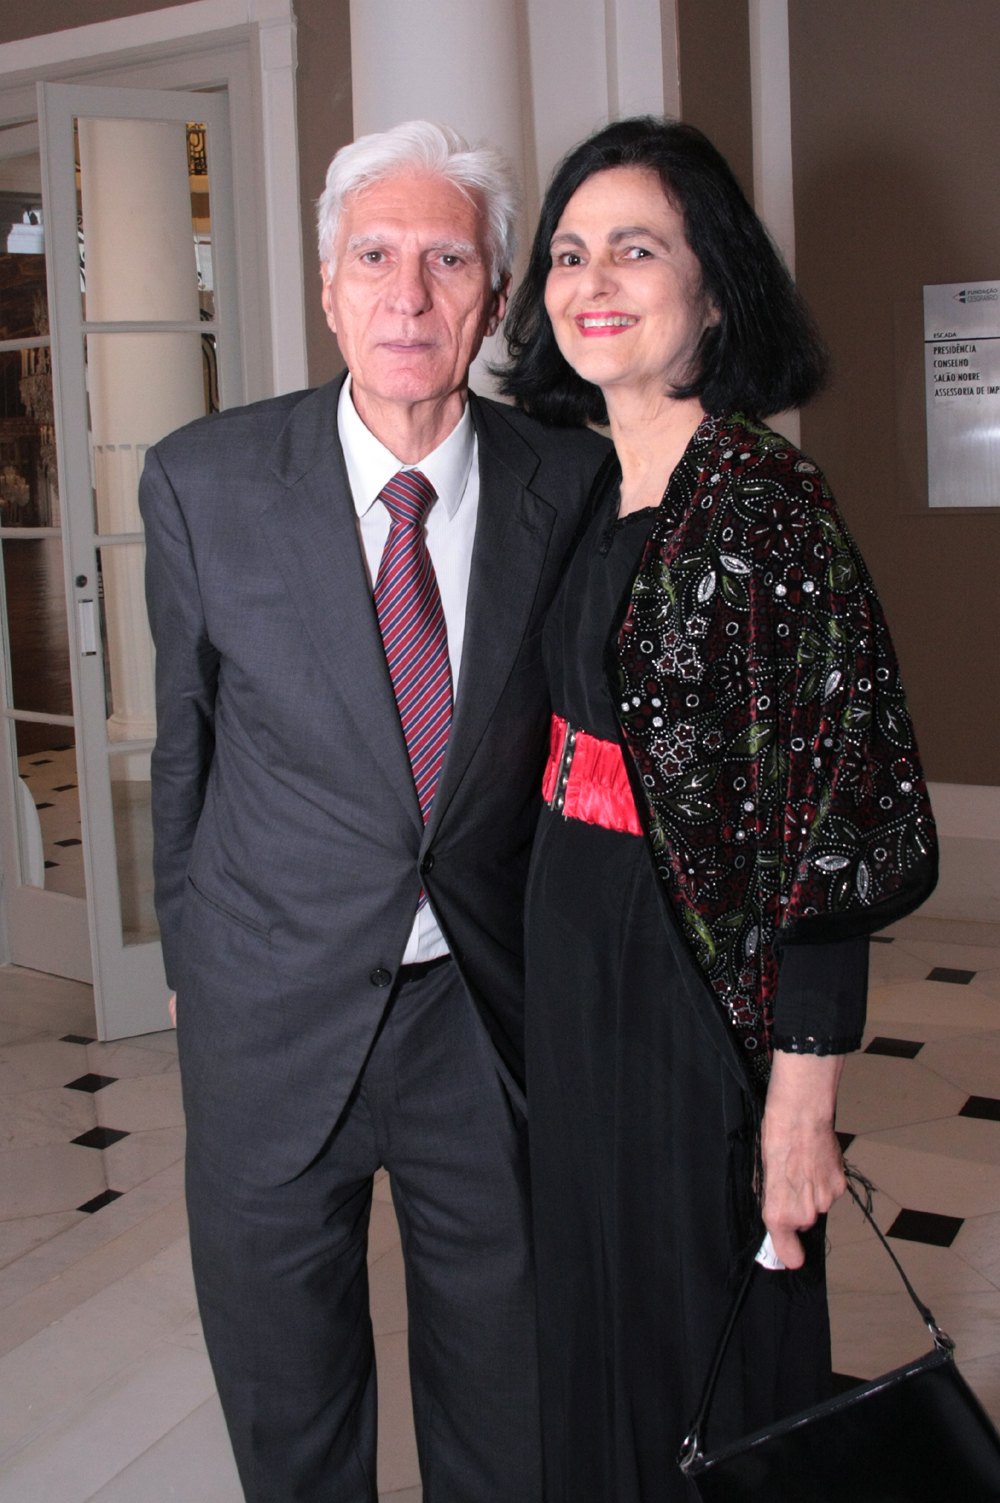 Roberto e Maria Judith Sucupira Lins